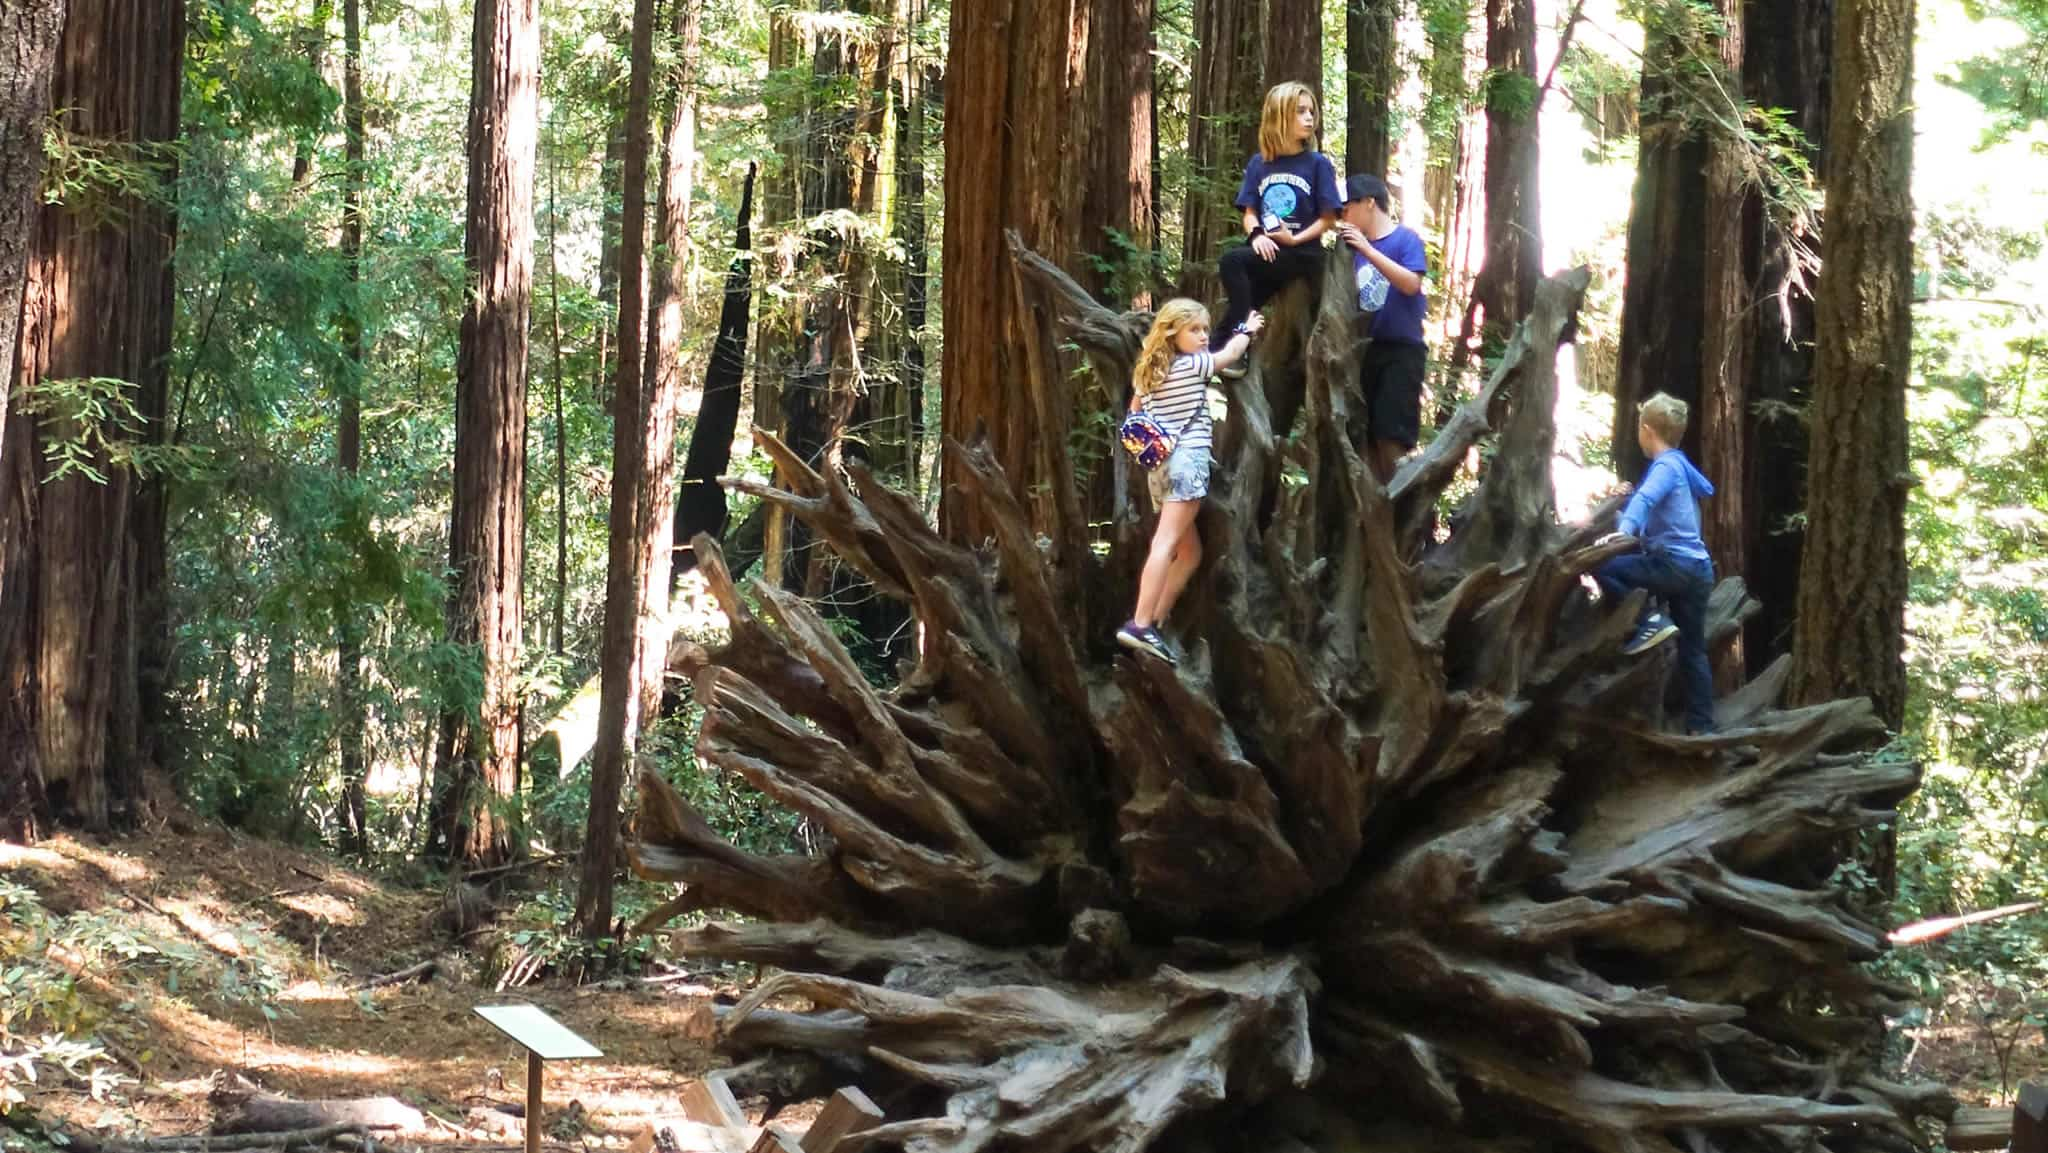 Hiking near healdsburg CA Armstrong Woods kids playing